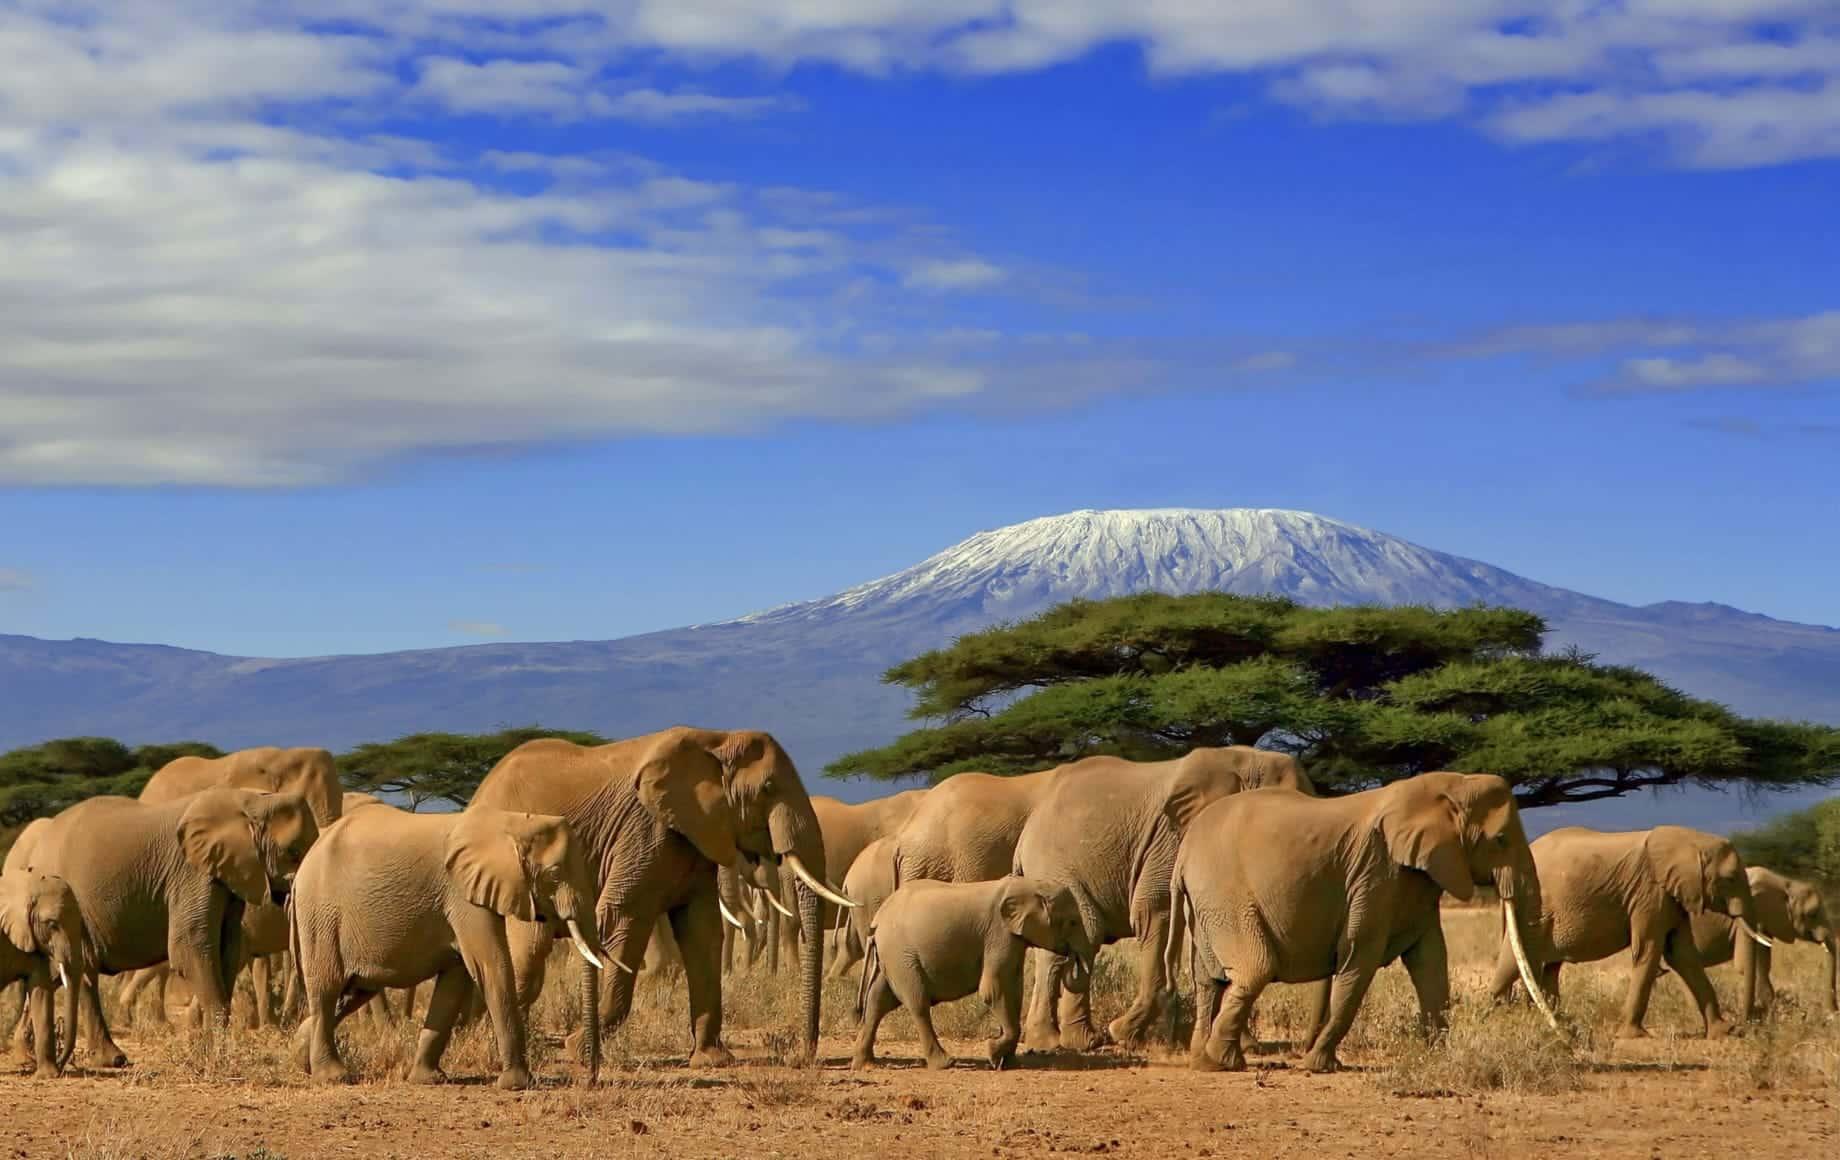 Elephant in Masai Mara, Kenya